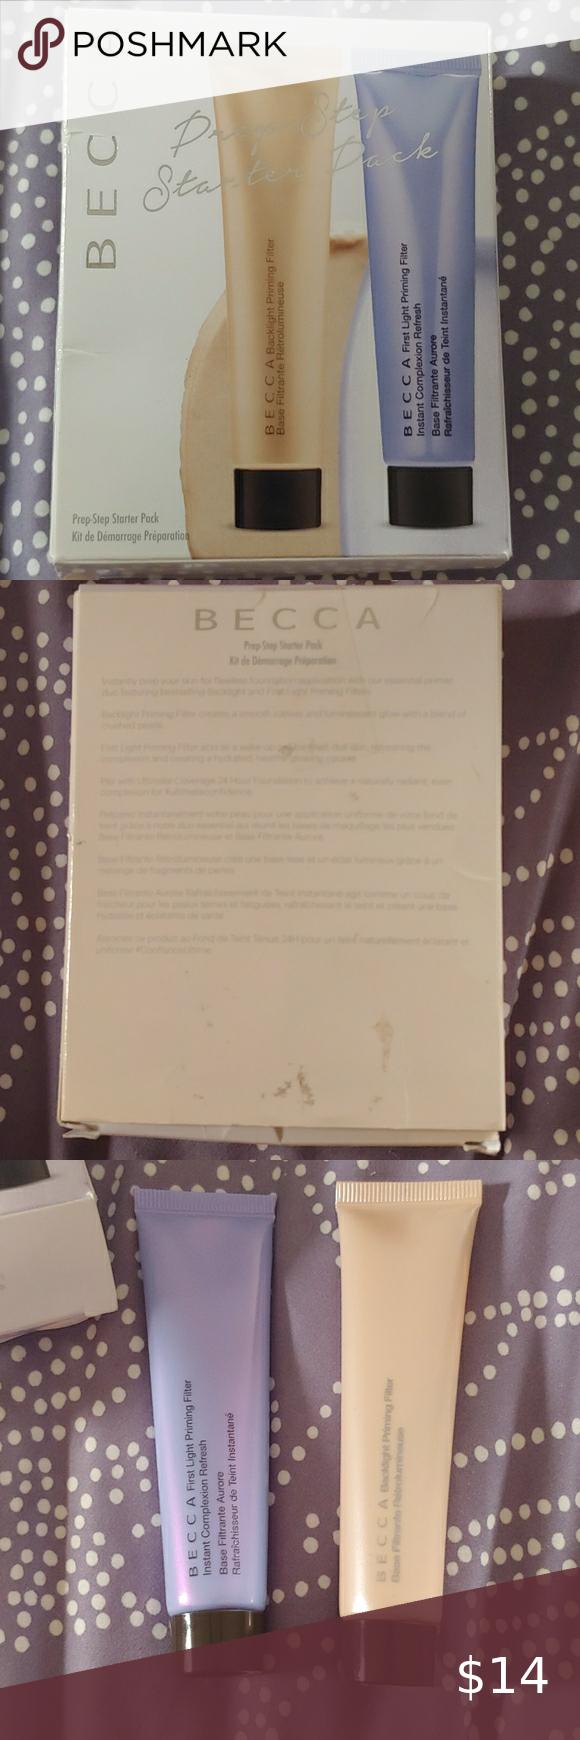 NIB BECCA prep-starter pack | Travel size products, Becca ...